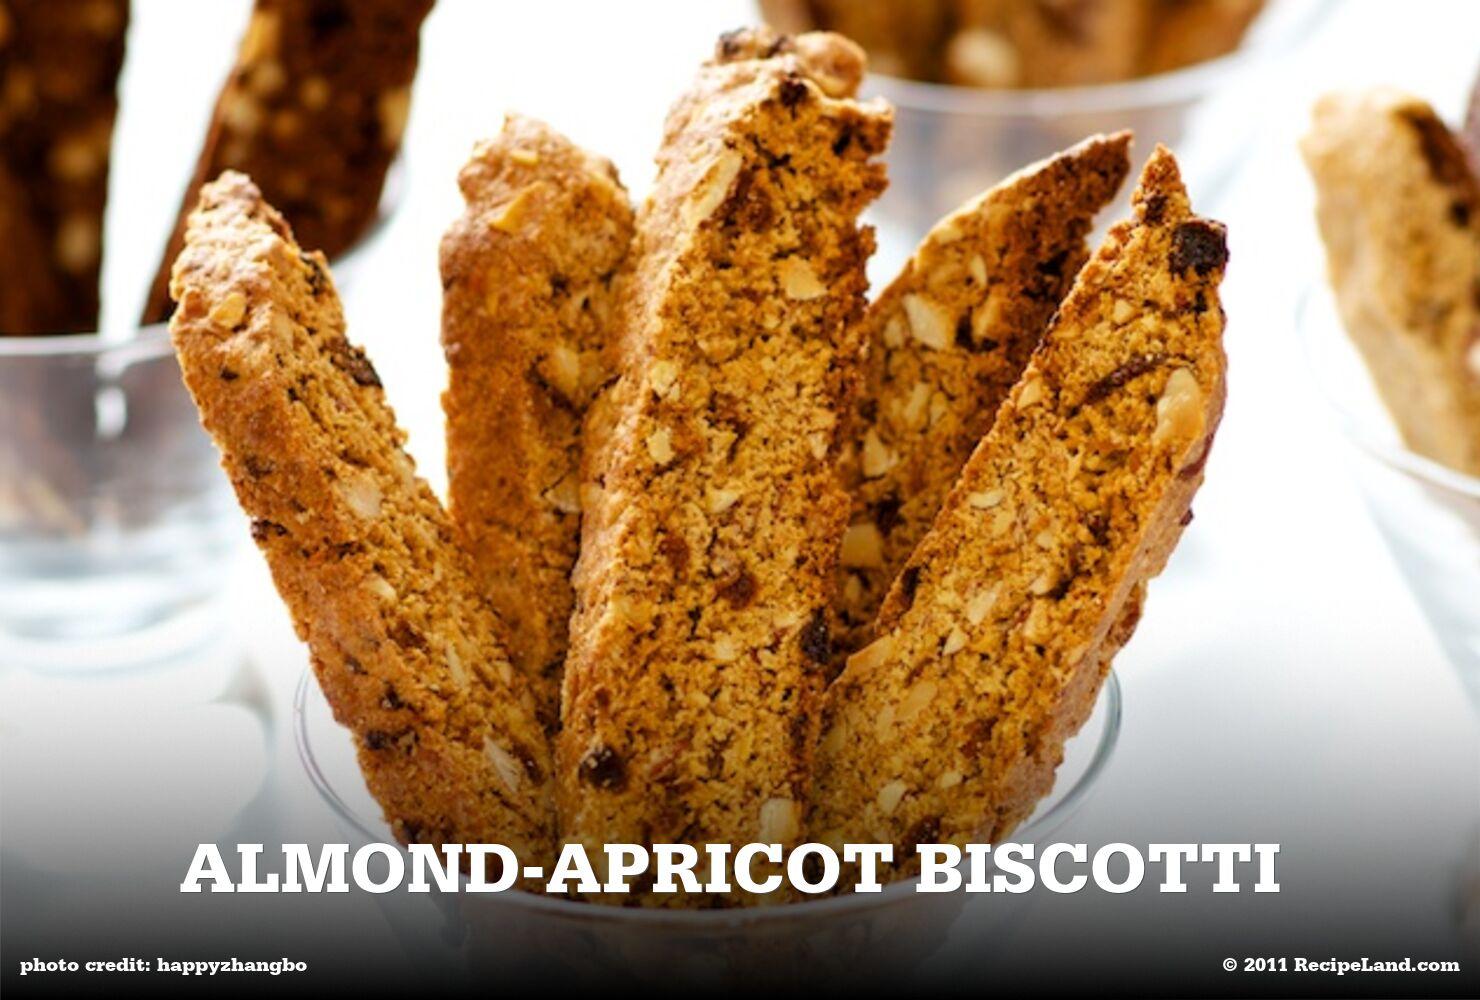 Almond-Apricot Biscotti